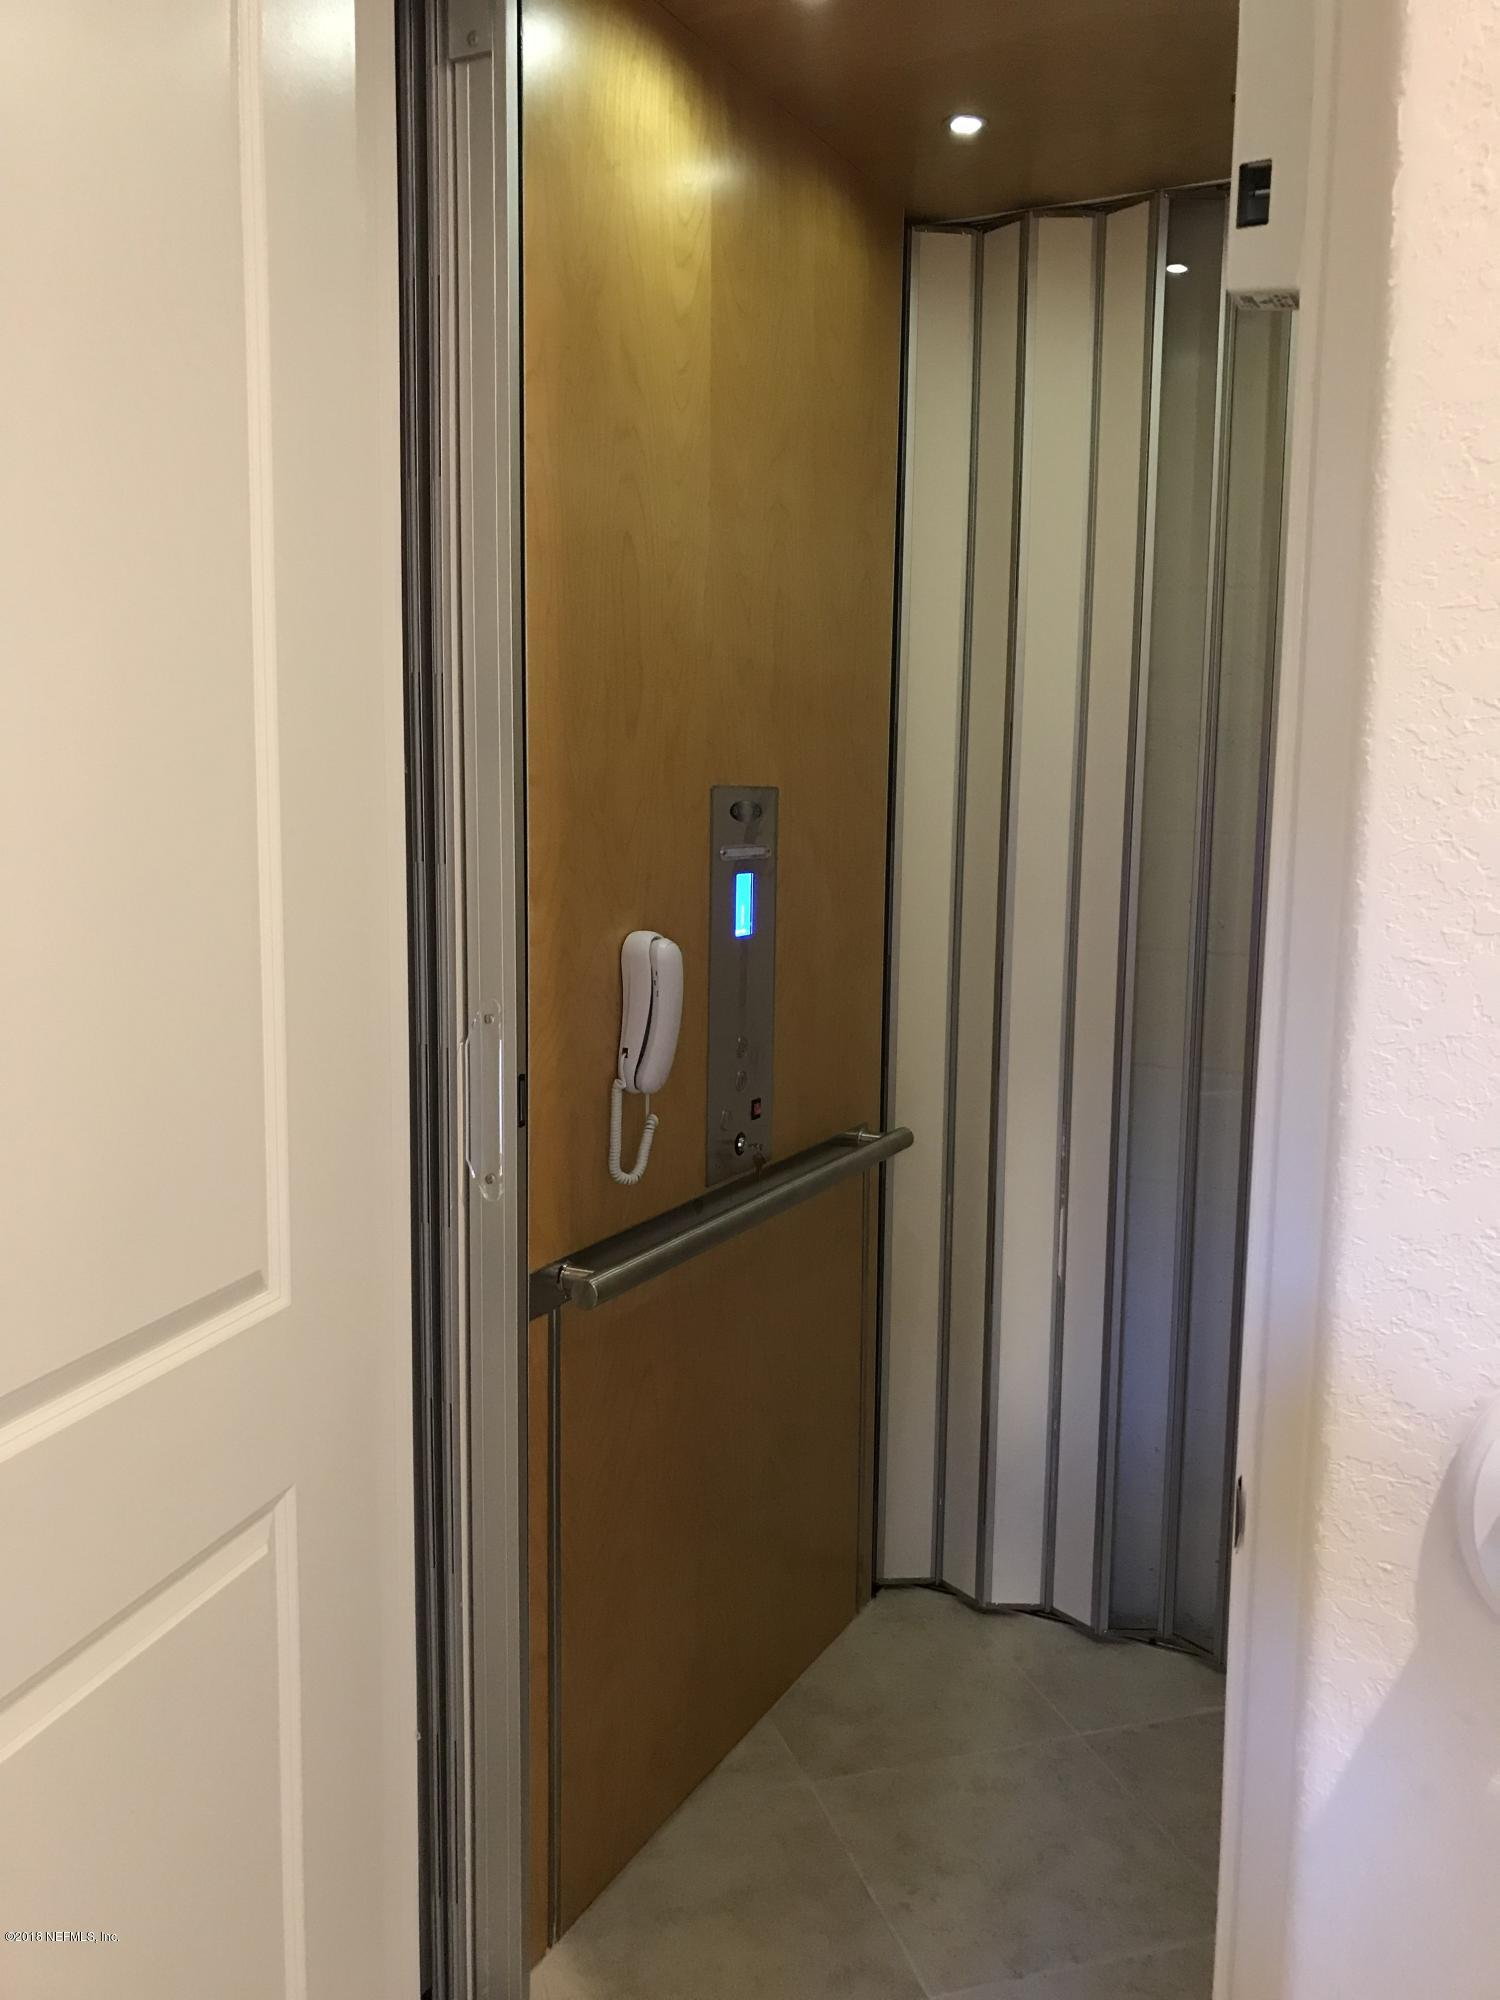 153 LATERRA LINKS, ST AUGUSTINE, FLORIDA 32092, 3 Bedrooms Bedrooms, ,3 BathroomsBathrooms,Condo,For sale,LATERRA LINKS,927781